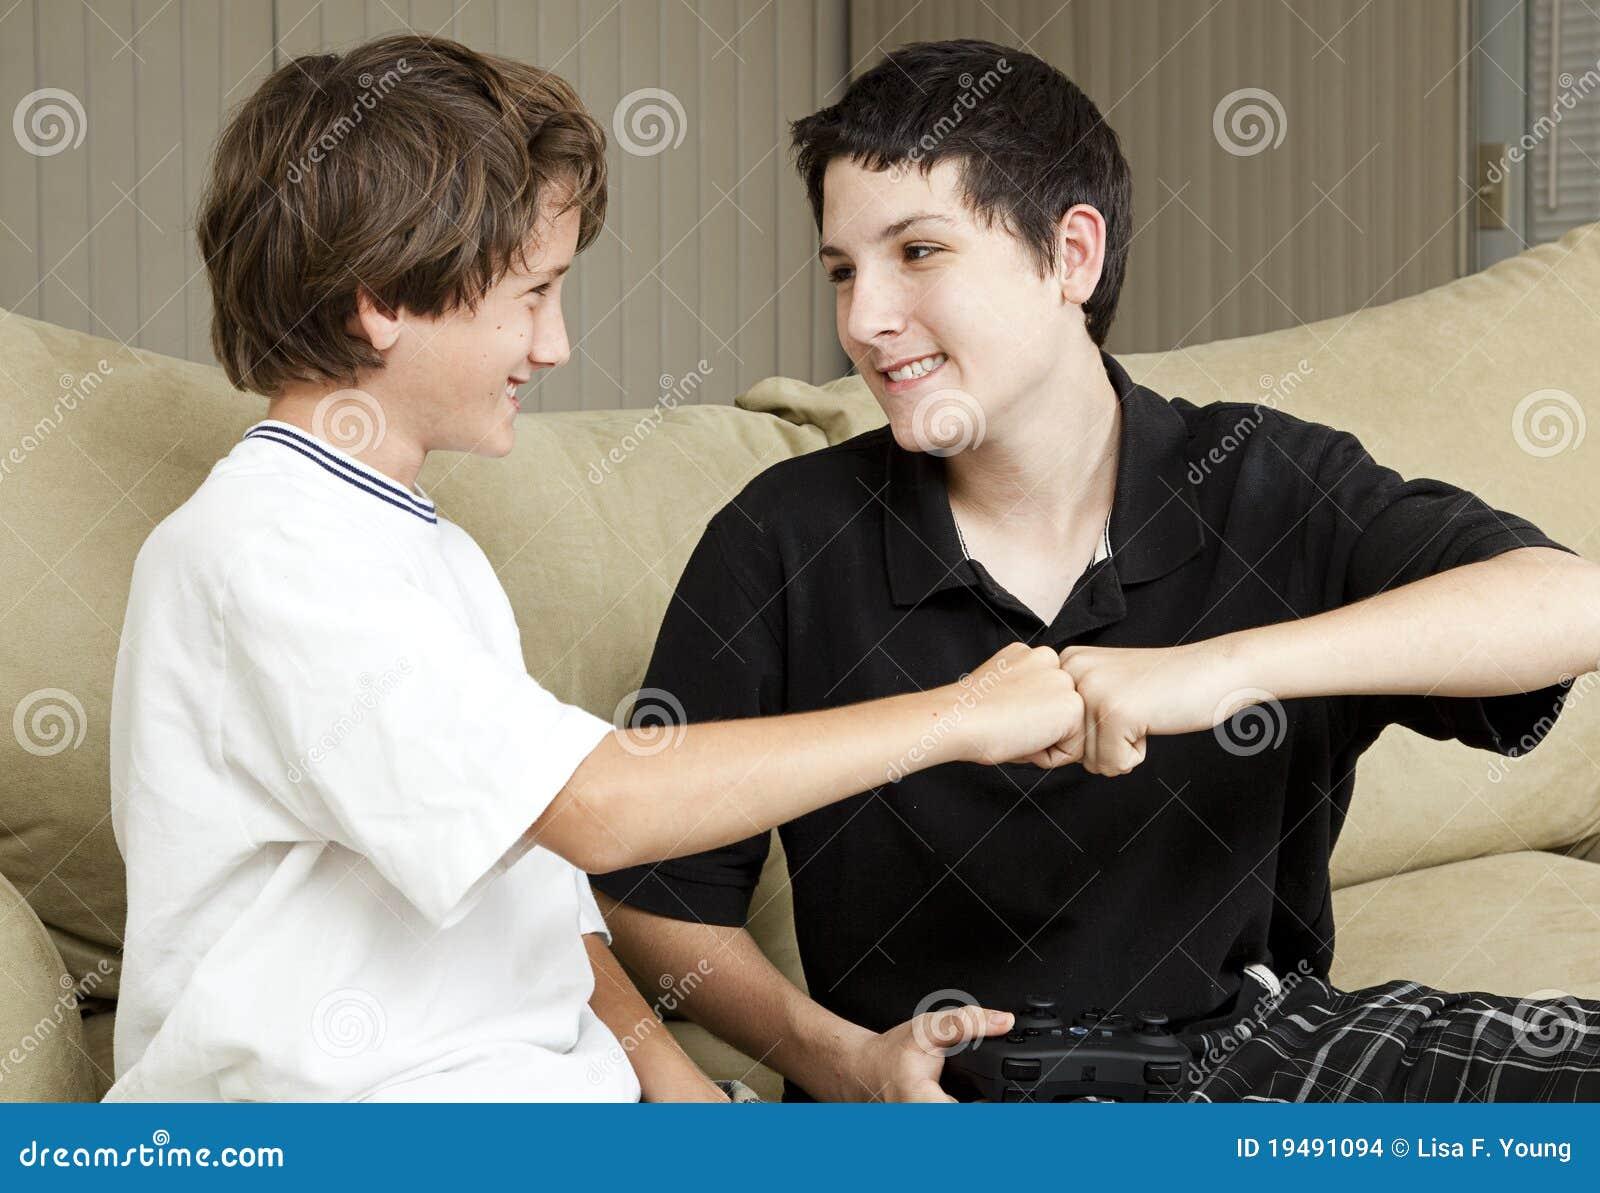 Brothers Fist Bump